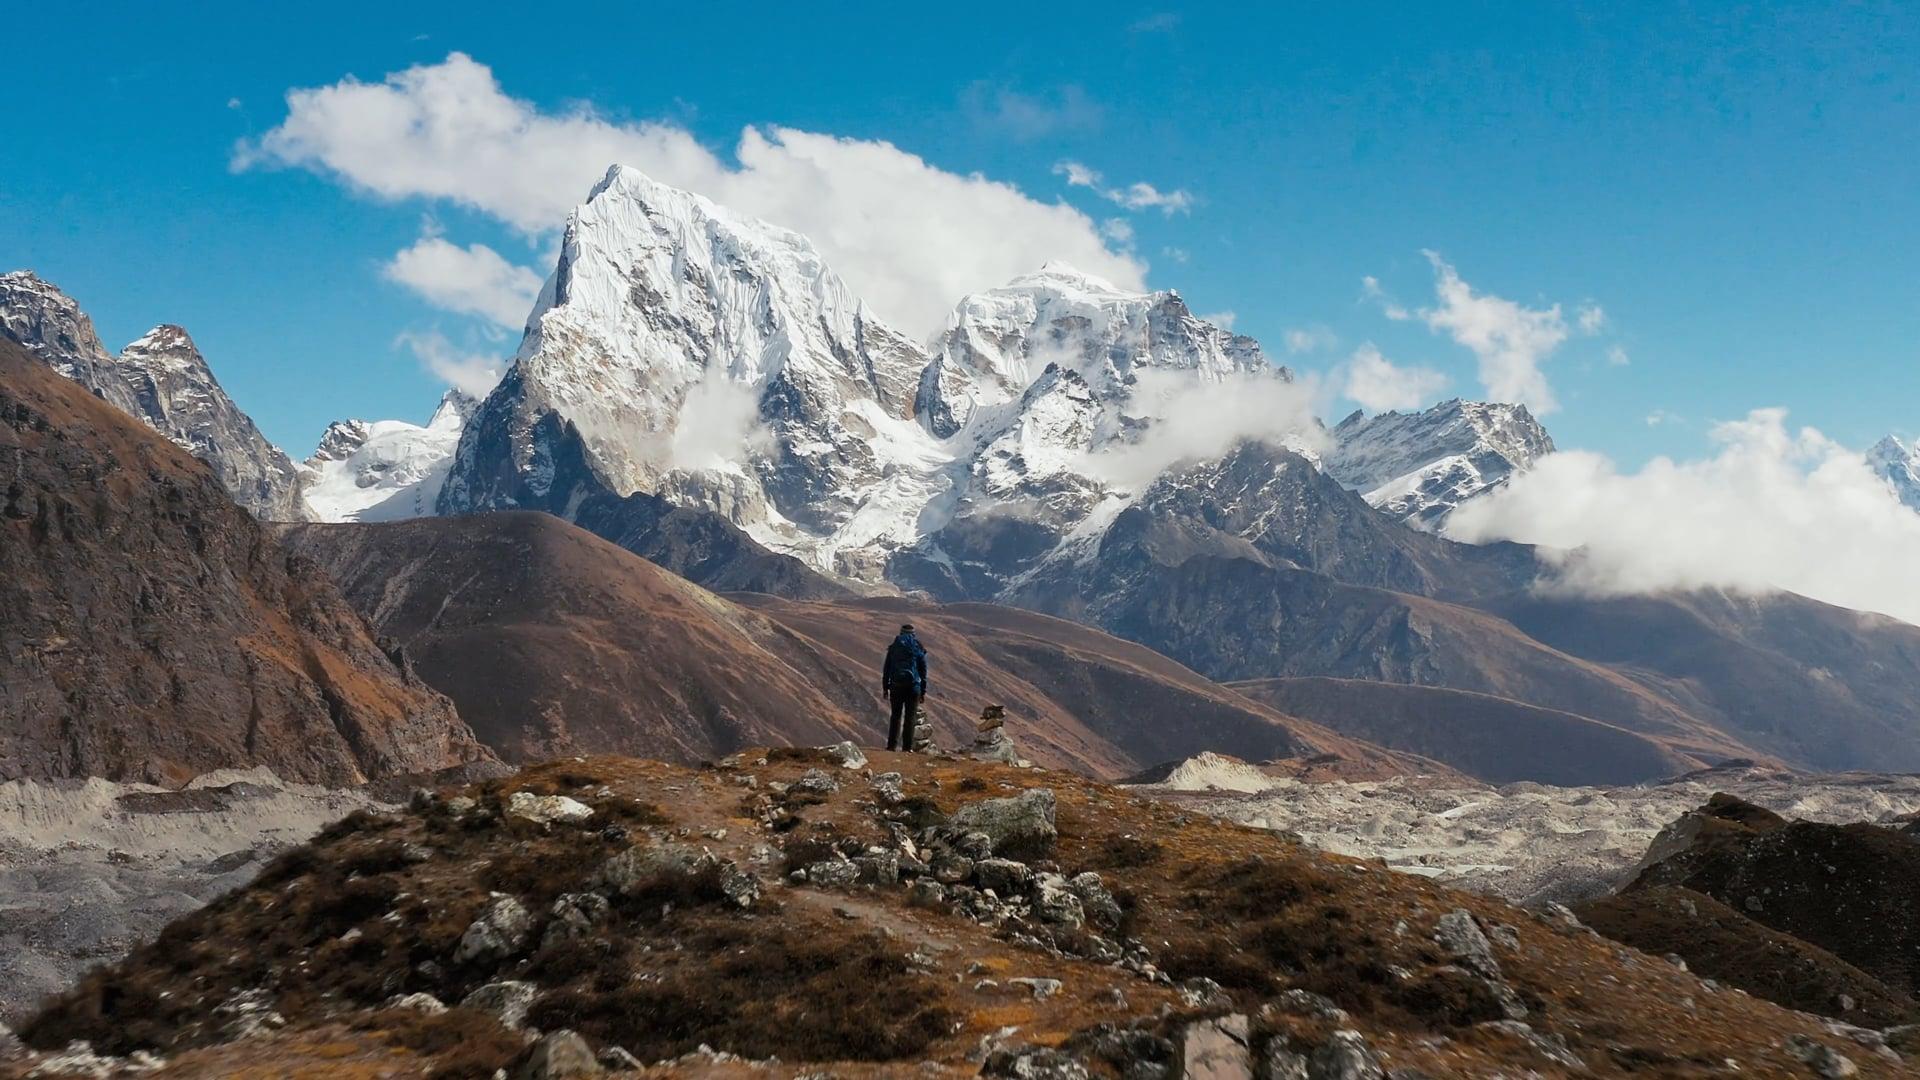 Dream Mountain Film - Official Trailer